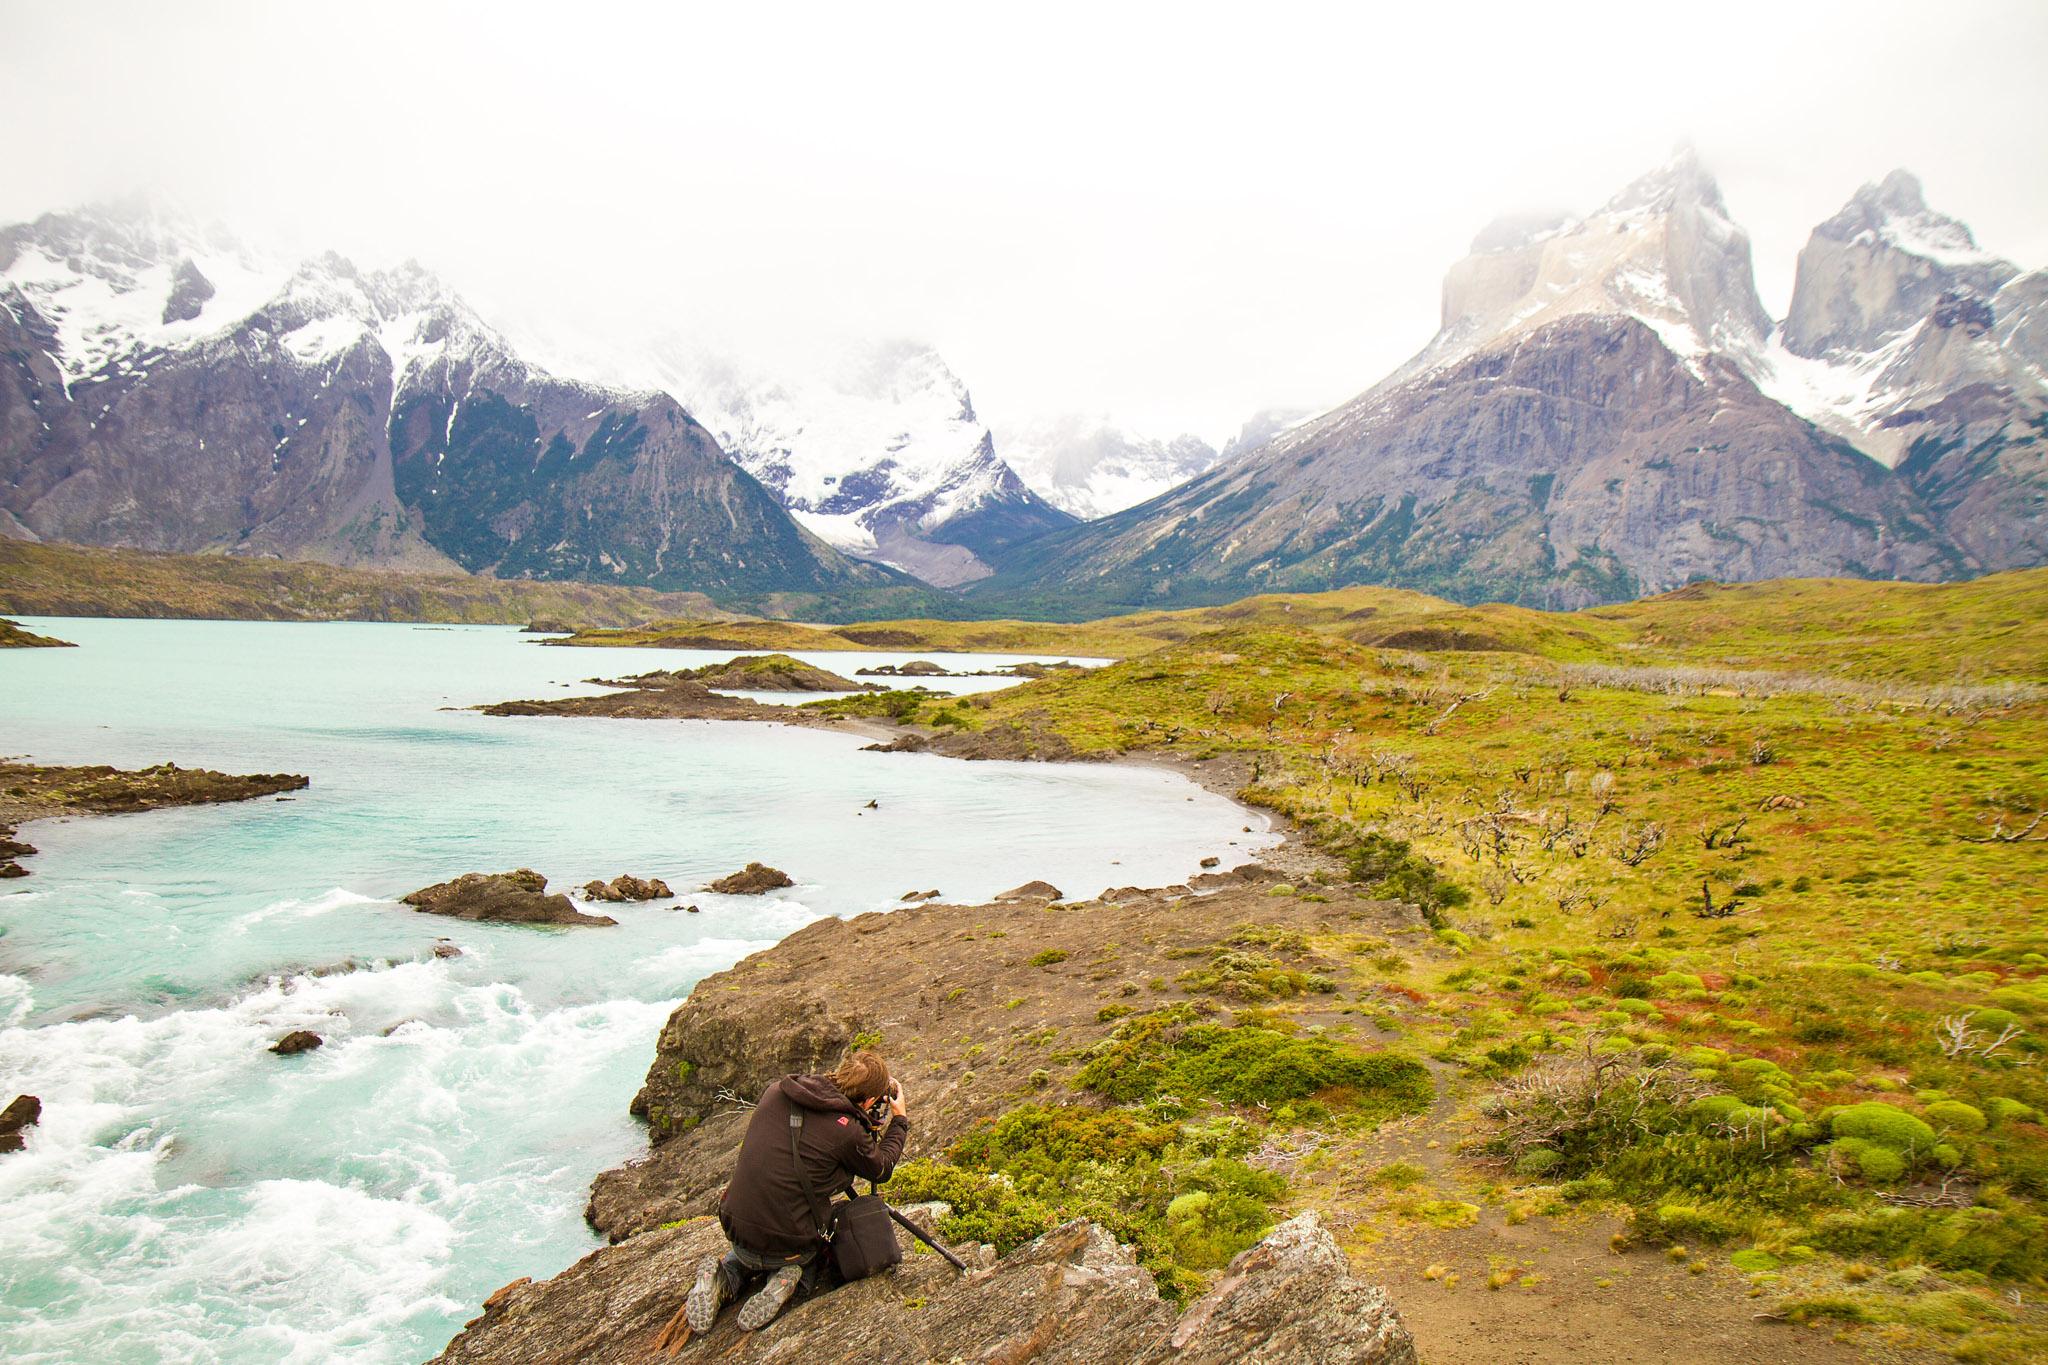 Wedding-Travellers-Overlanding-Destination-Wedding-Chile-Torres-del-Paine-turquoise-cuernos-lago-lake-nordenskjold-river-backstage-photographer-taking-picture